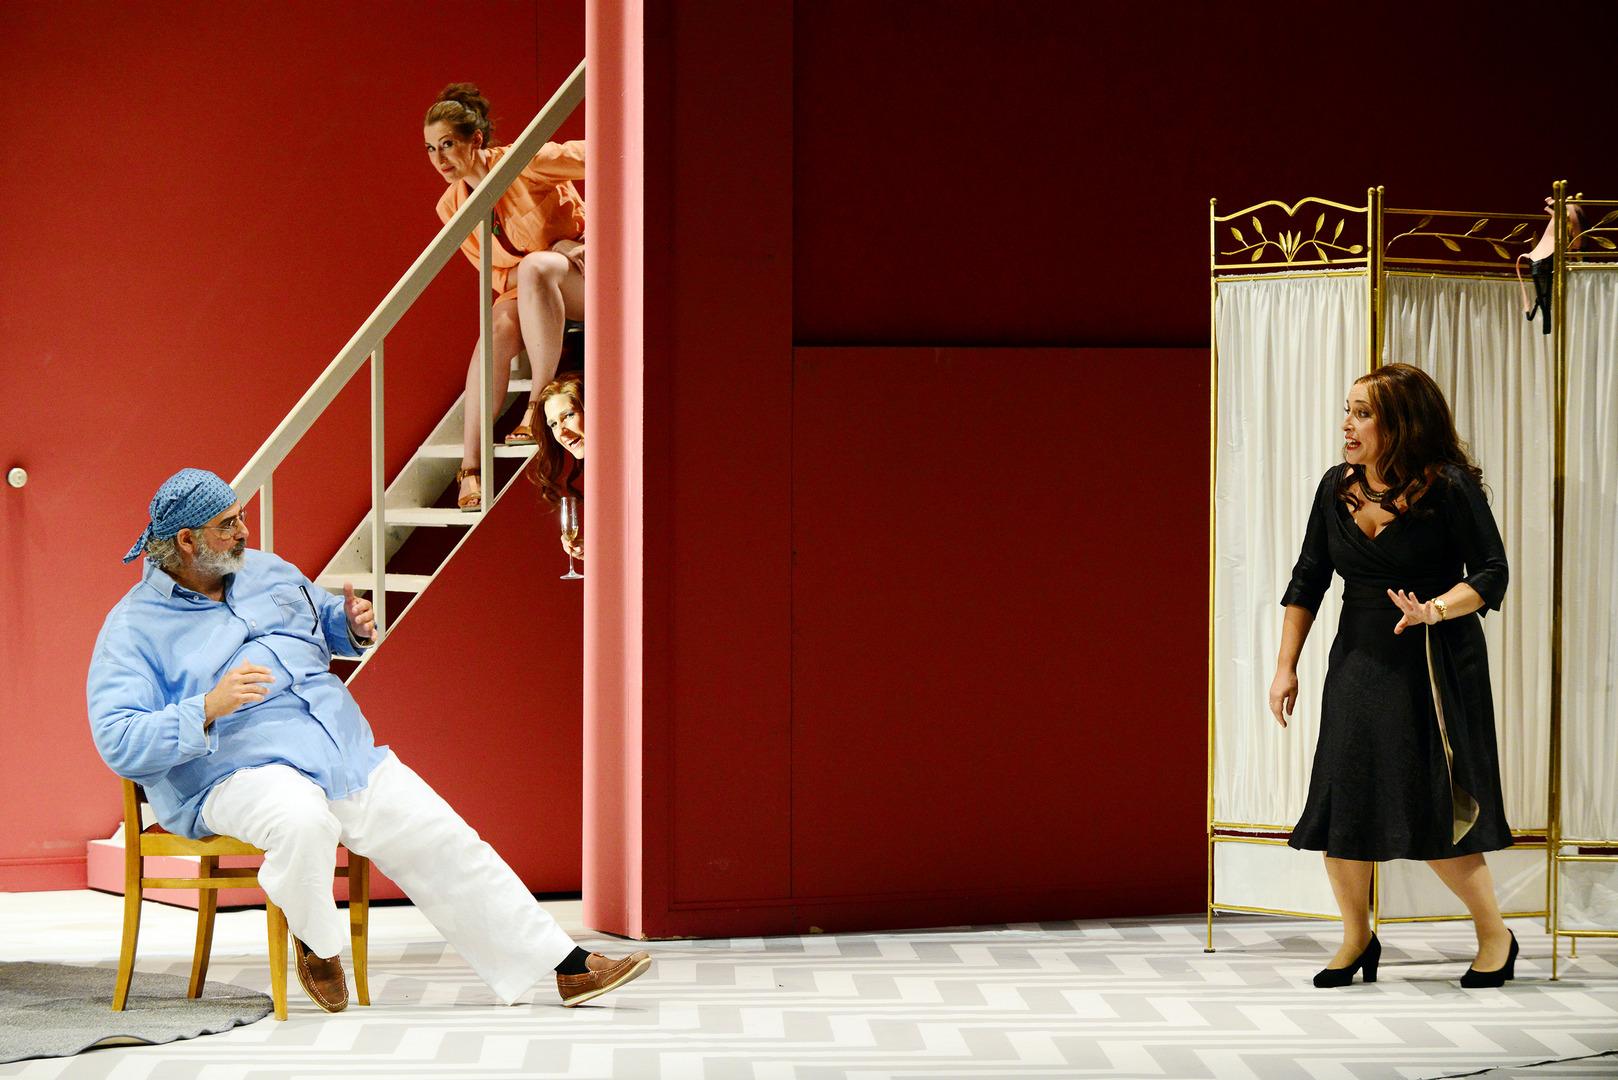 Falstaff-Opera-by-Giuseppe-Verdi-directed-by-Jacopo-Spirei- in-Karlsruhe-6